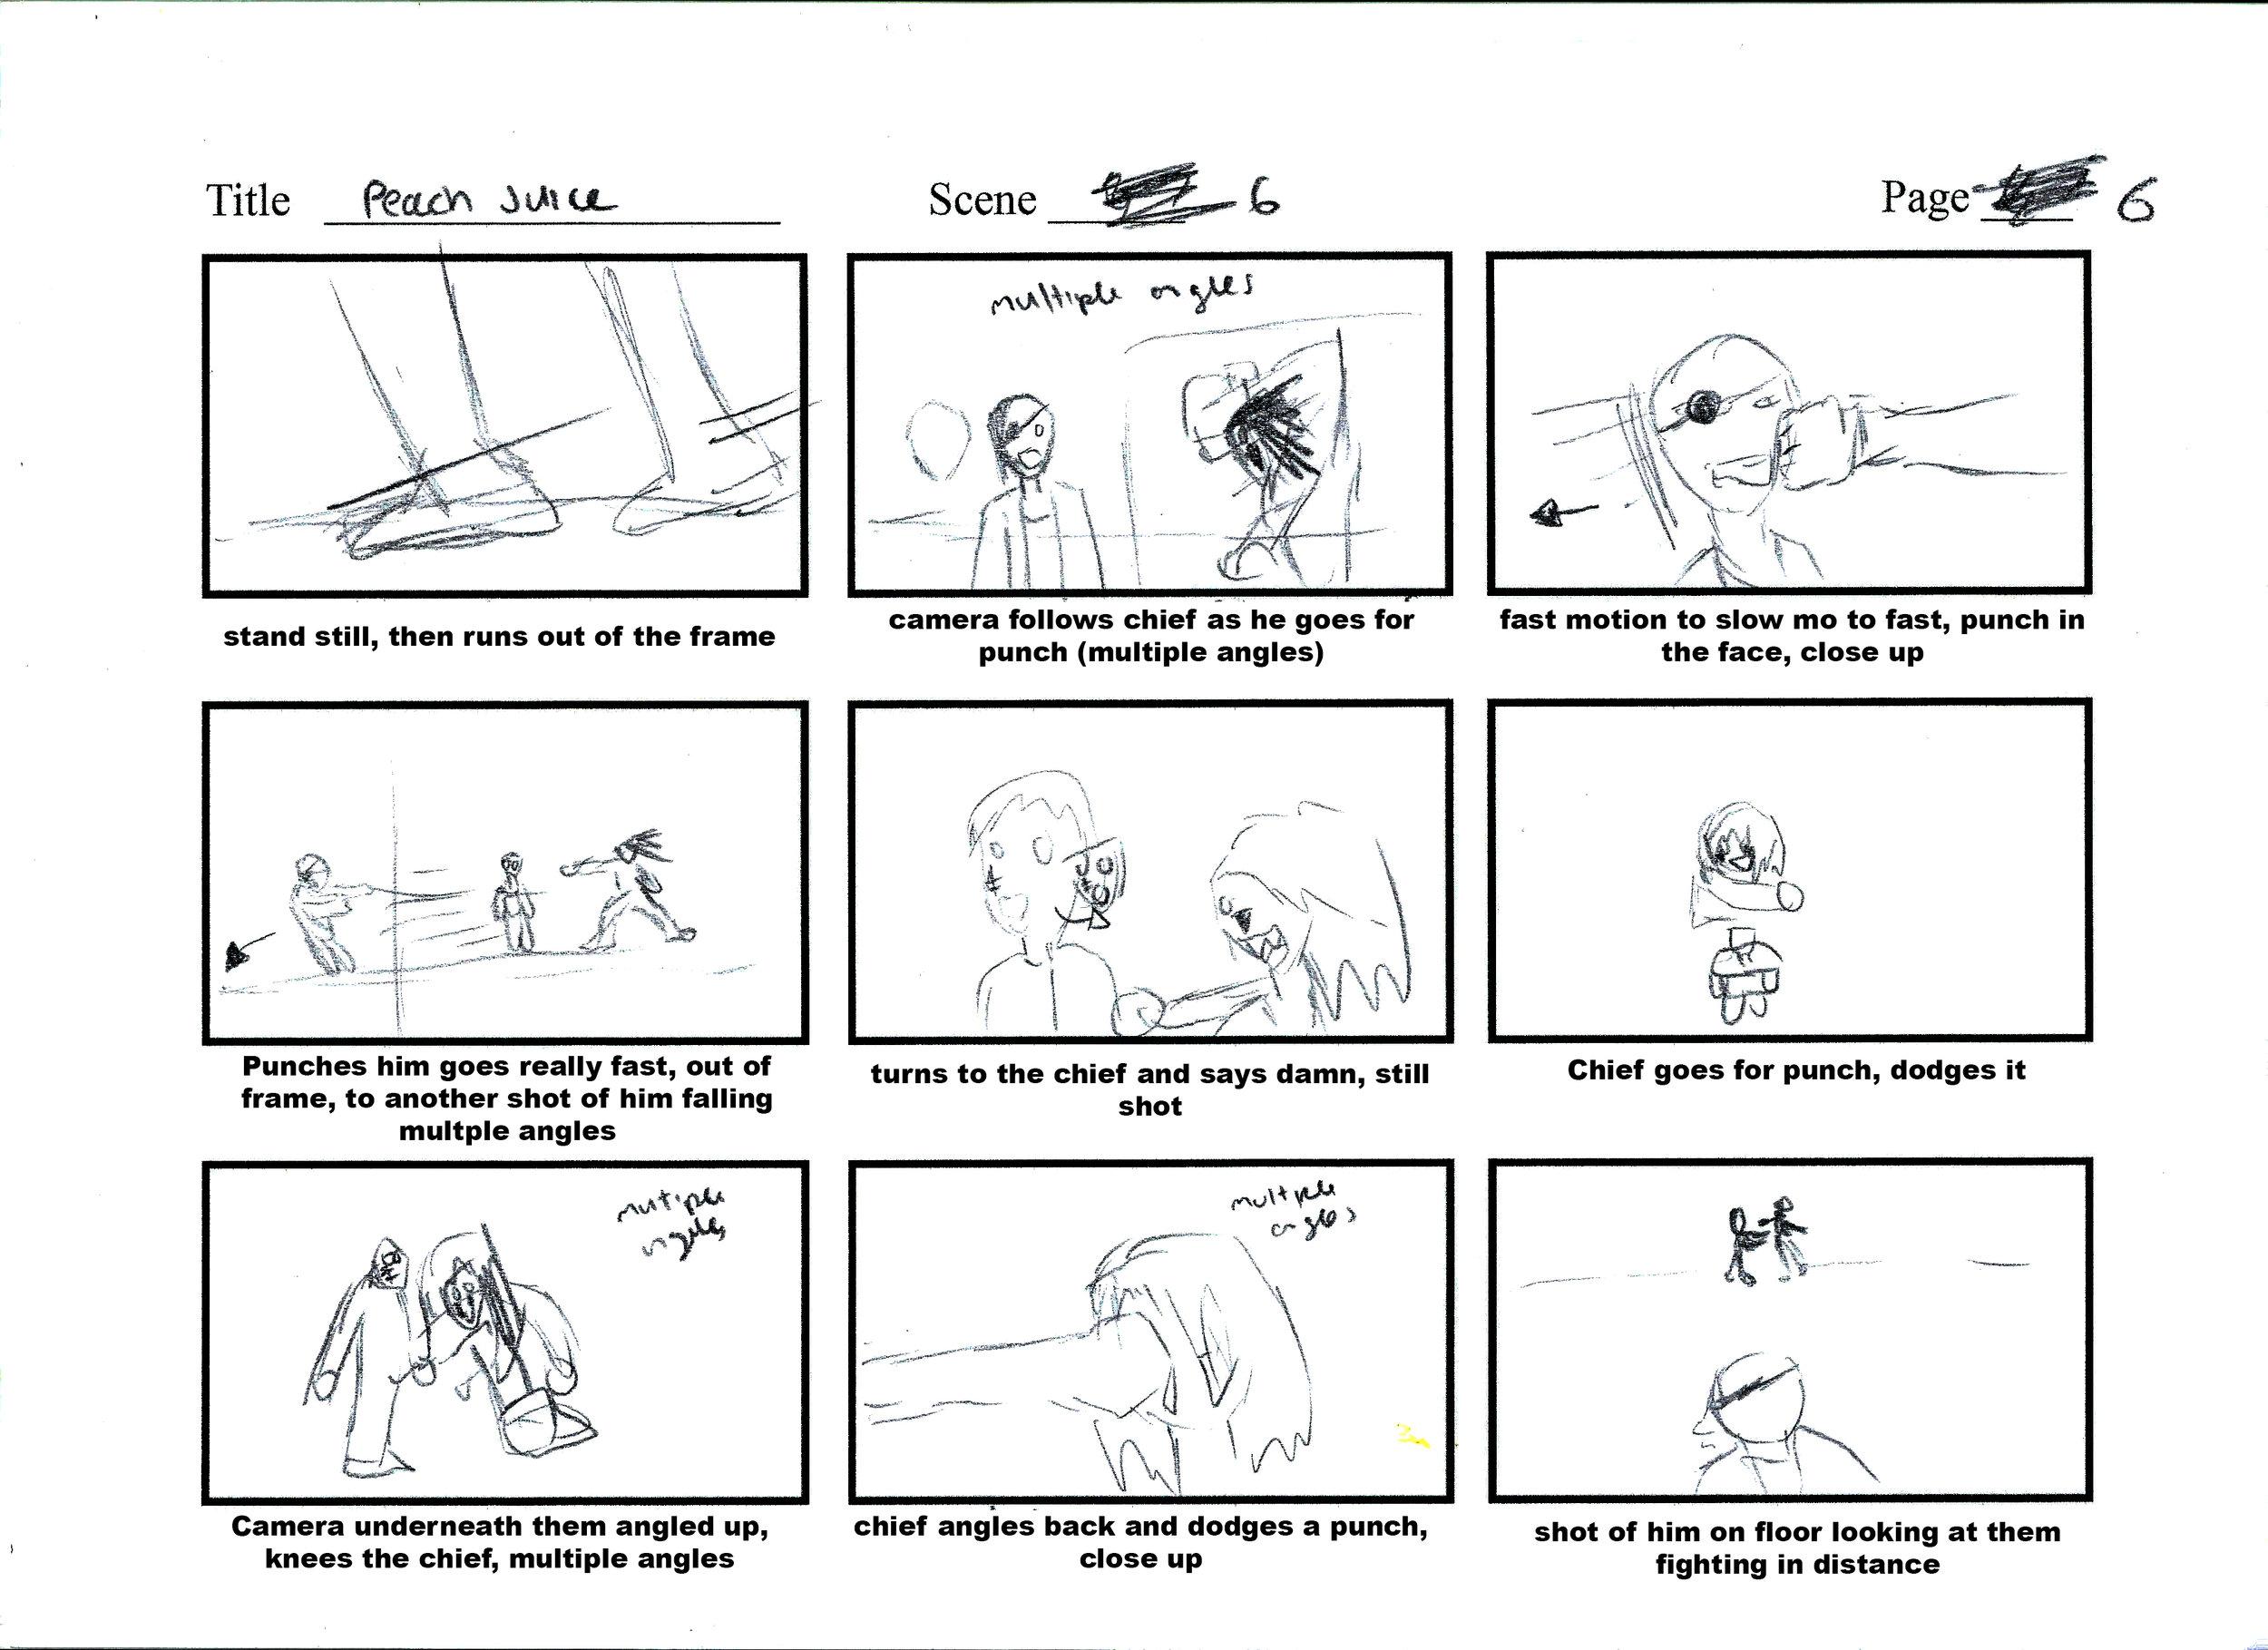 peace juice storyboard 6.jpg